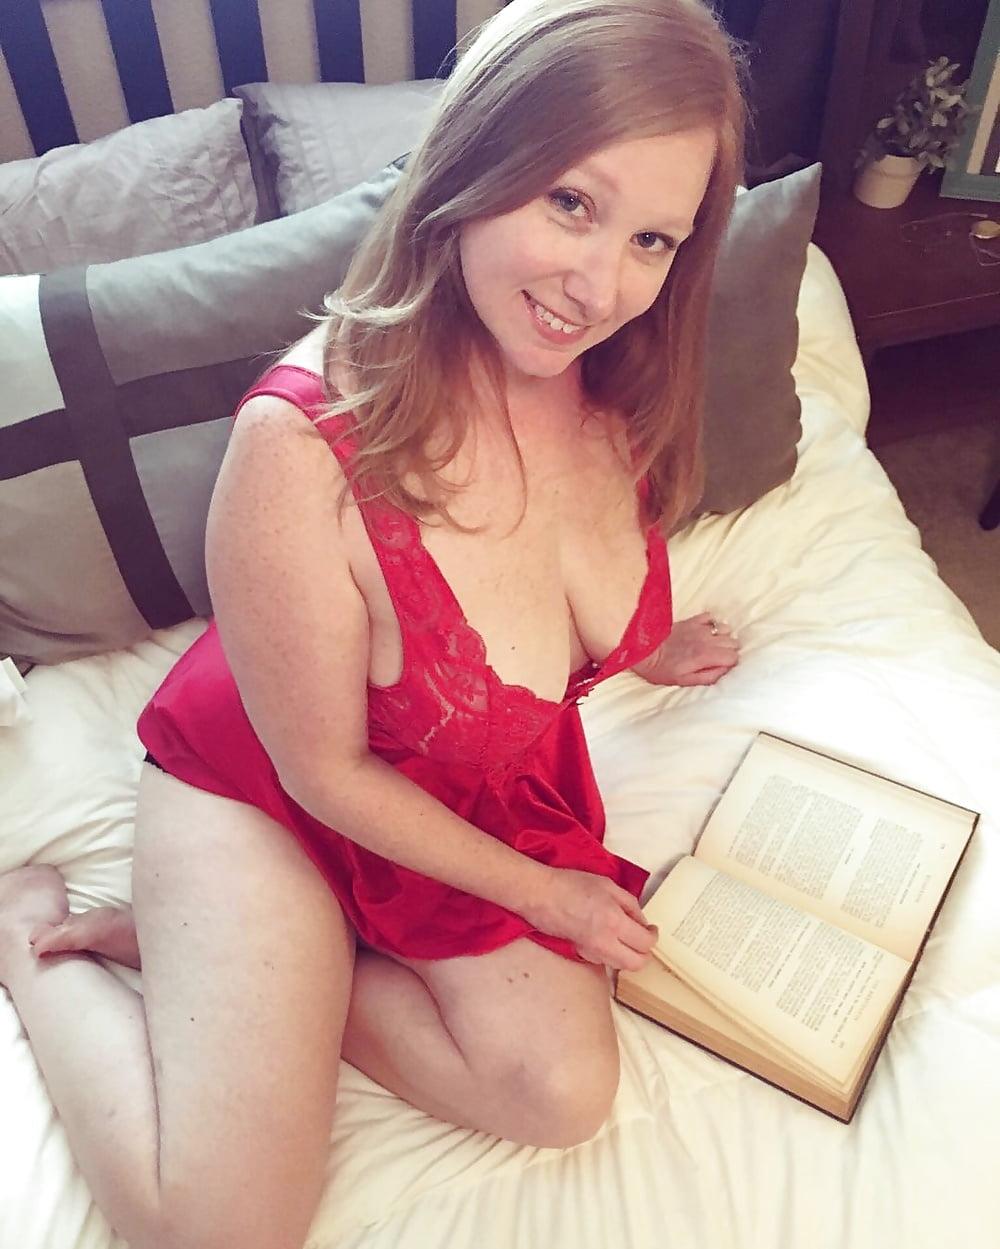 Yanks busty ginny denmarc masturbating - 1 part 9